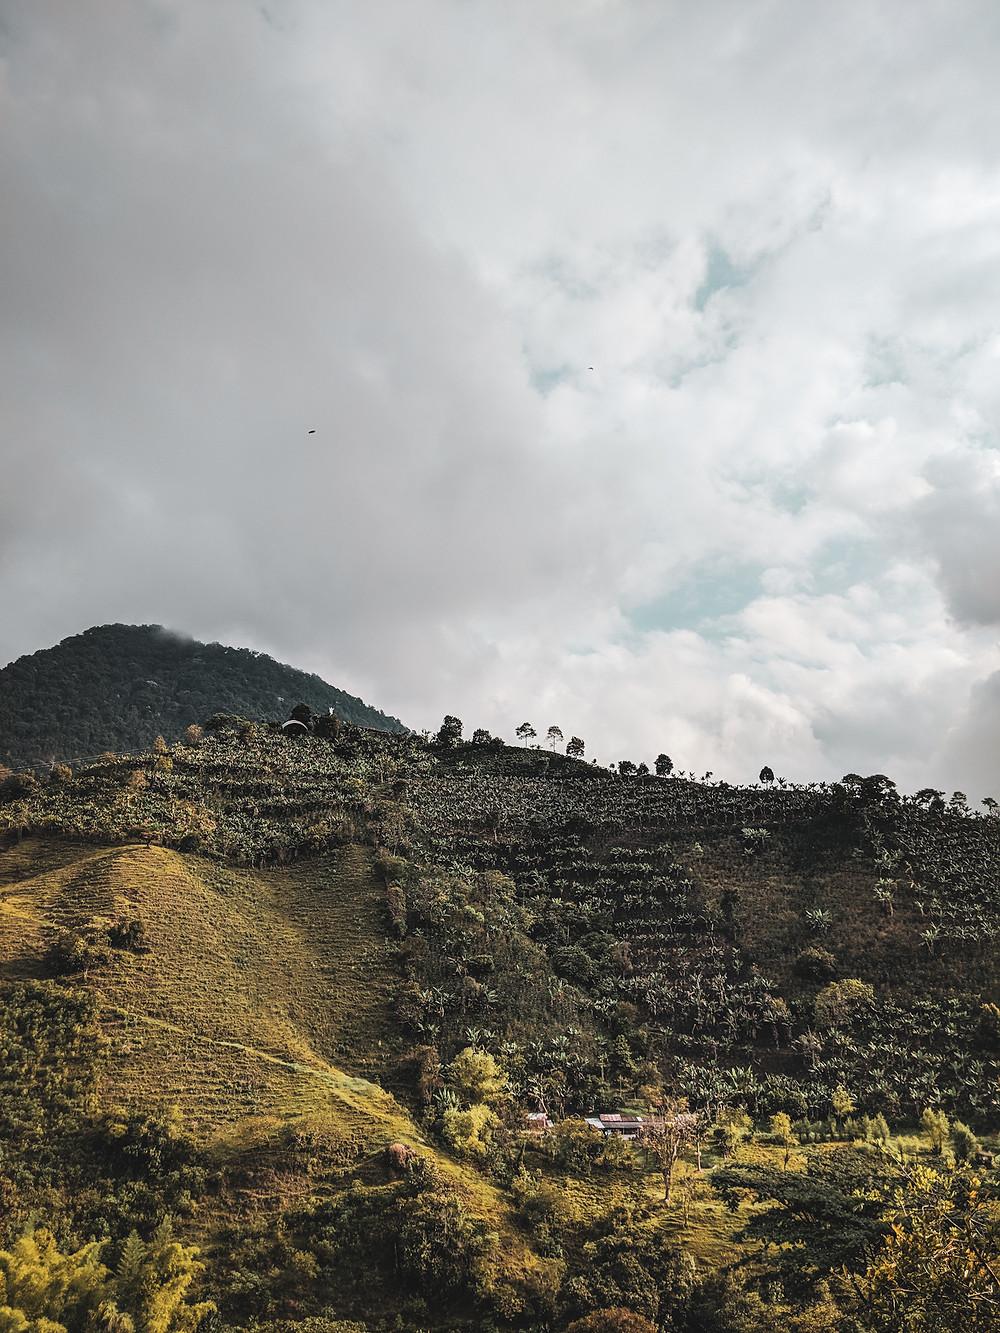 Mountain views near Jardin, Colombia.